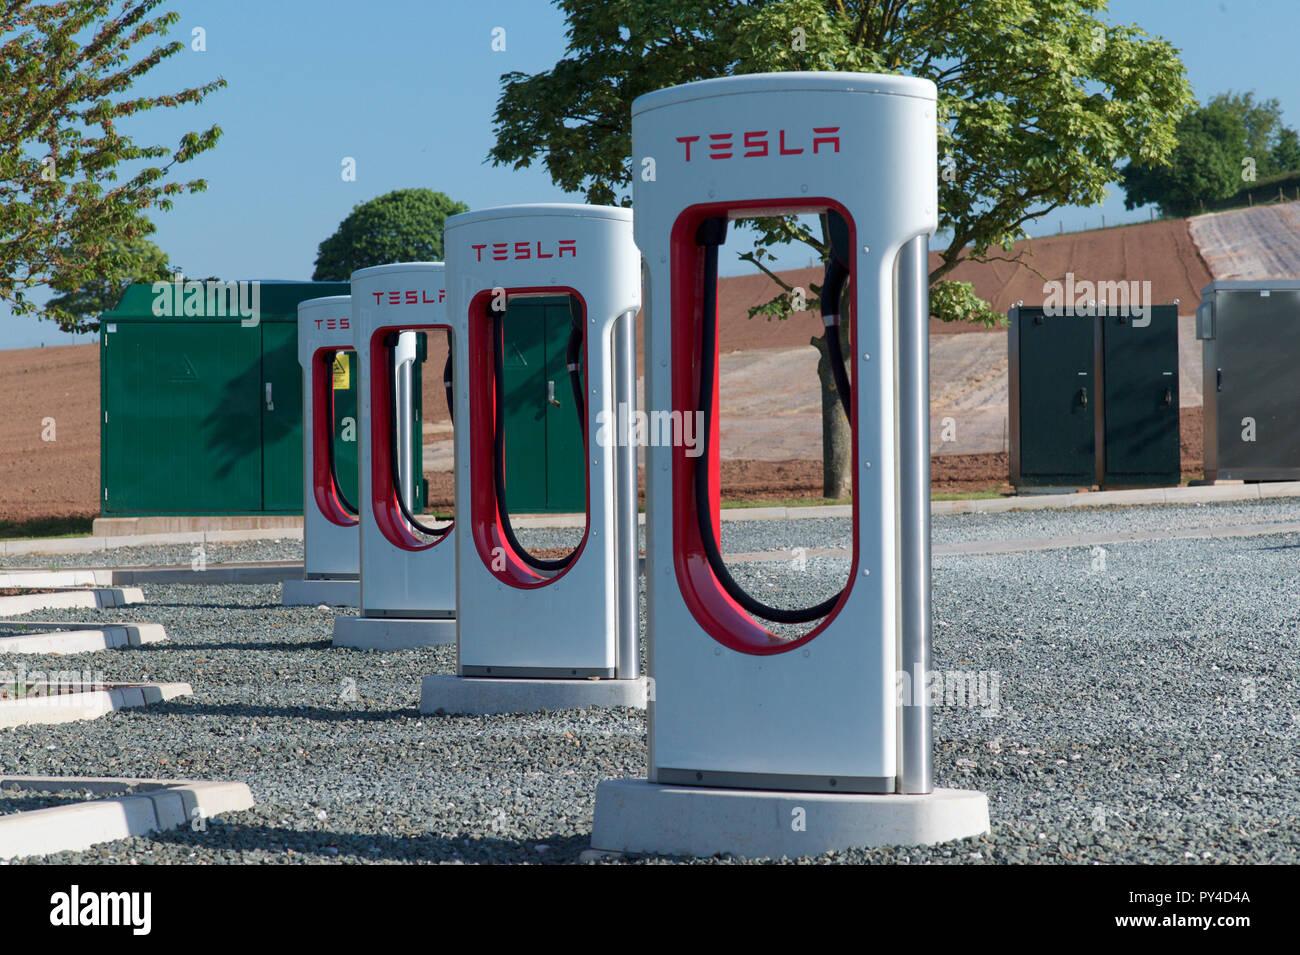 Tesla. Electric charging point, UK - Stock Image